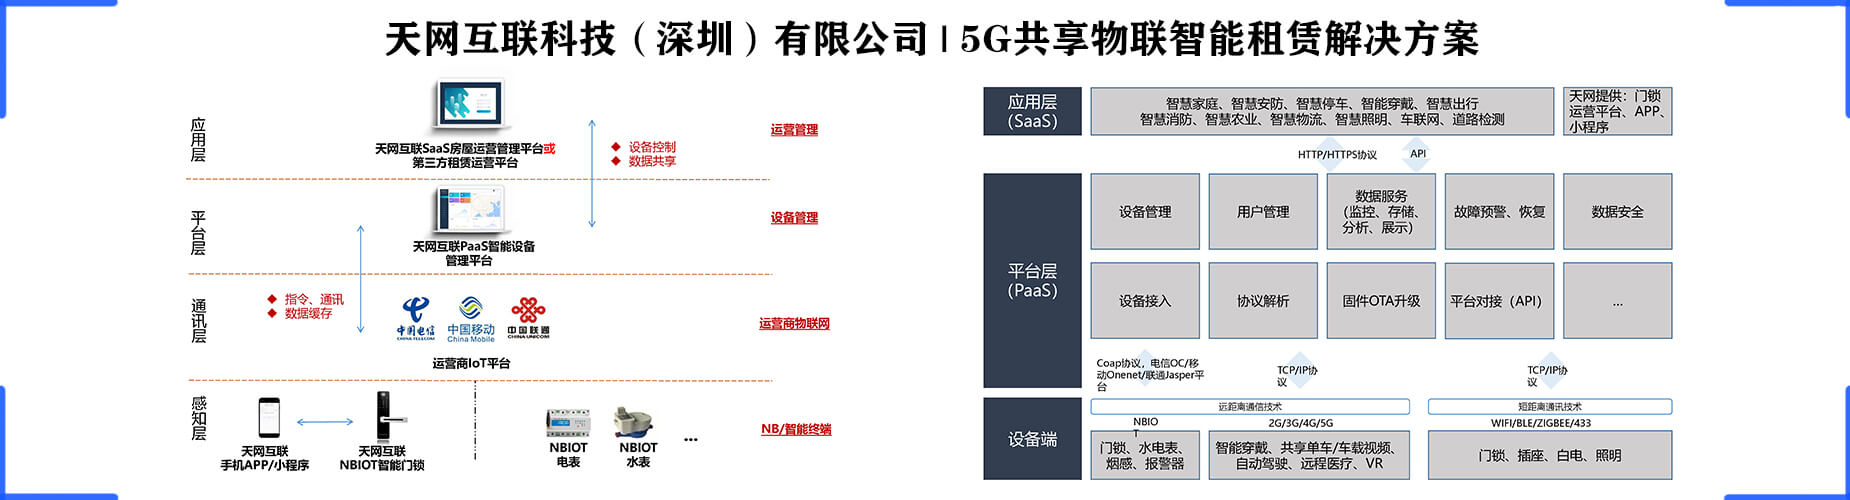 5G共享物联智能租赁解决方案